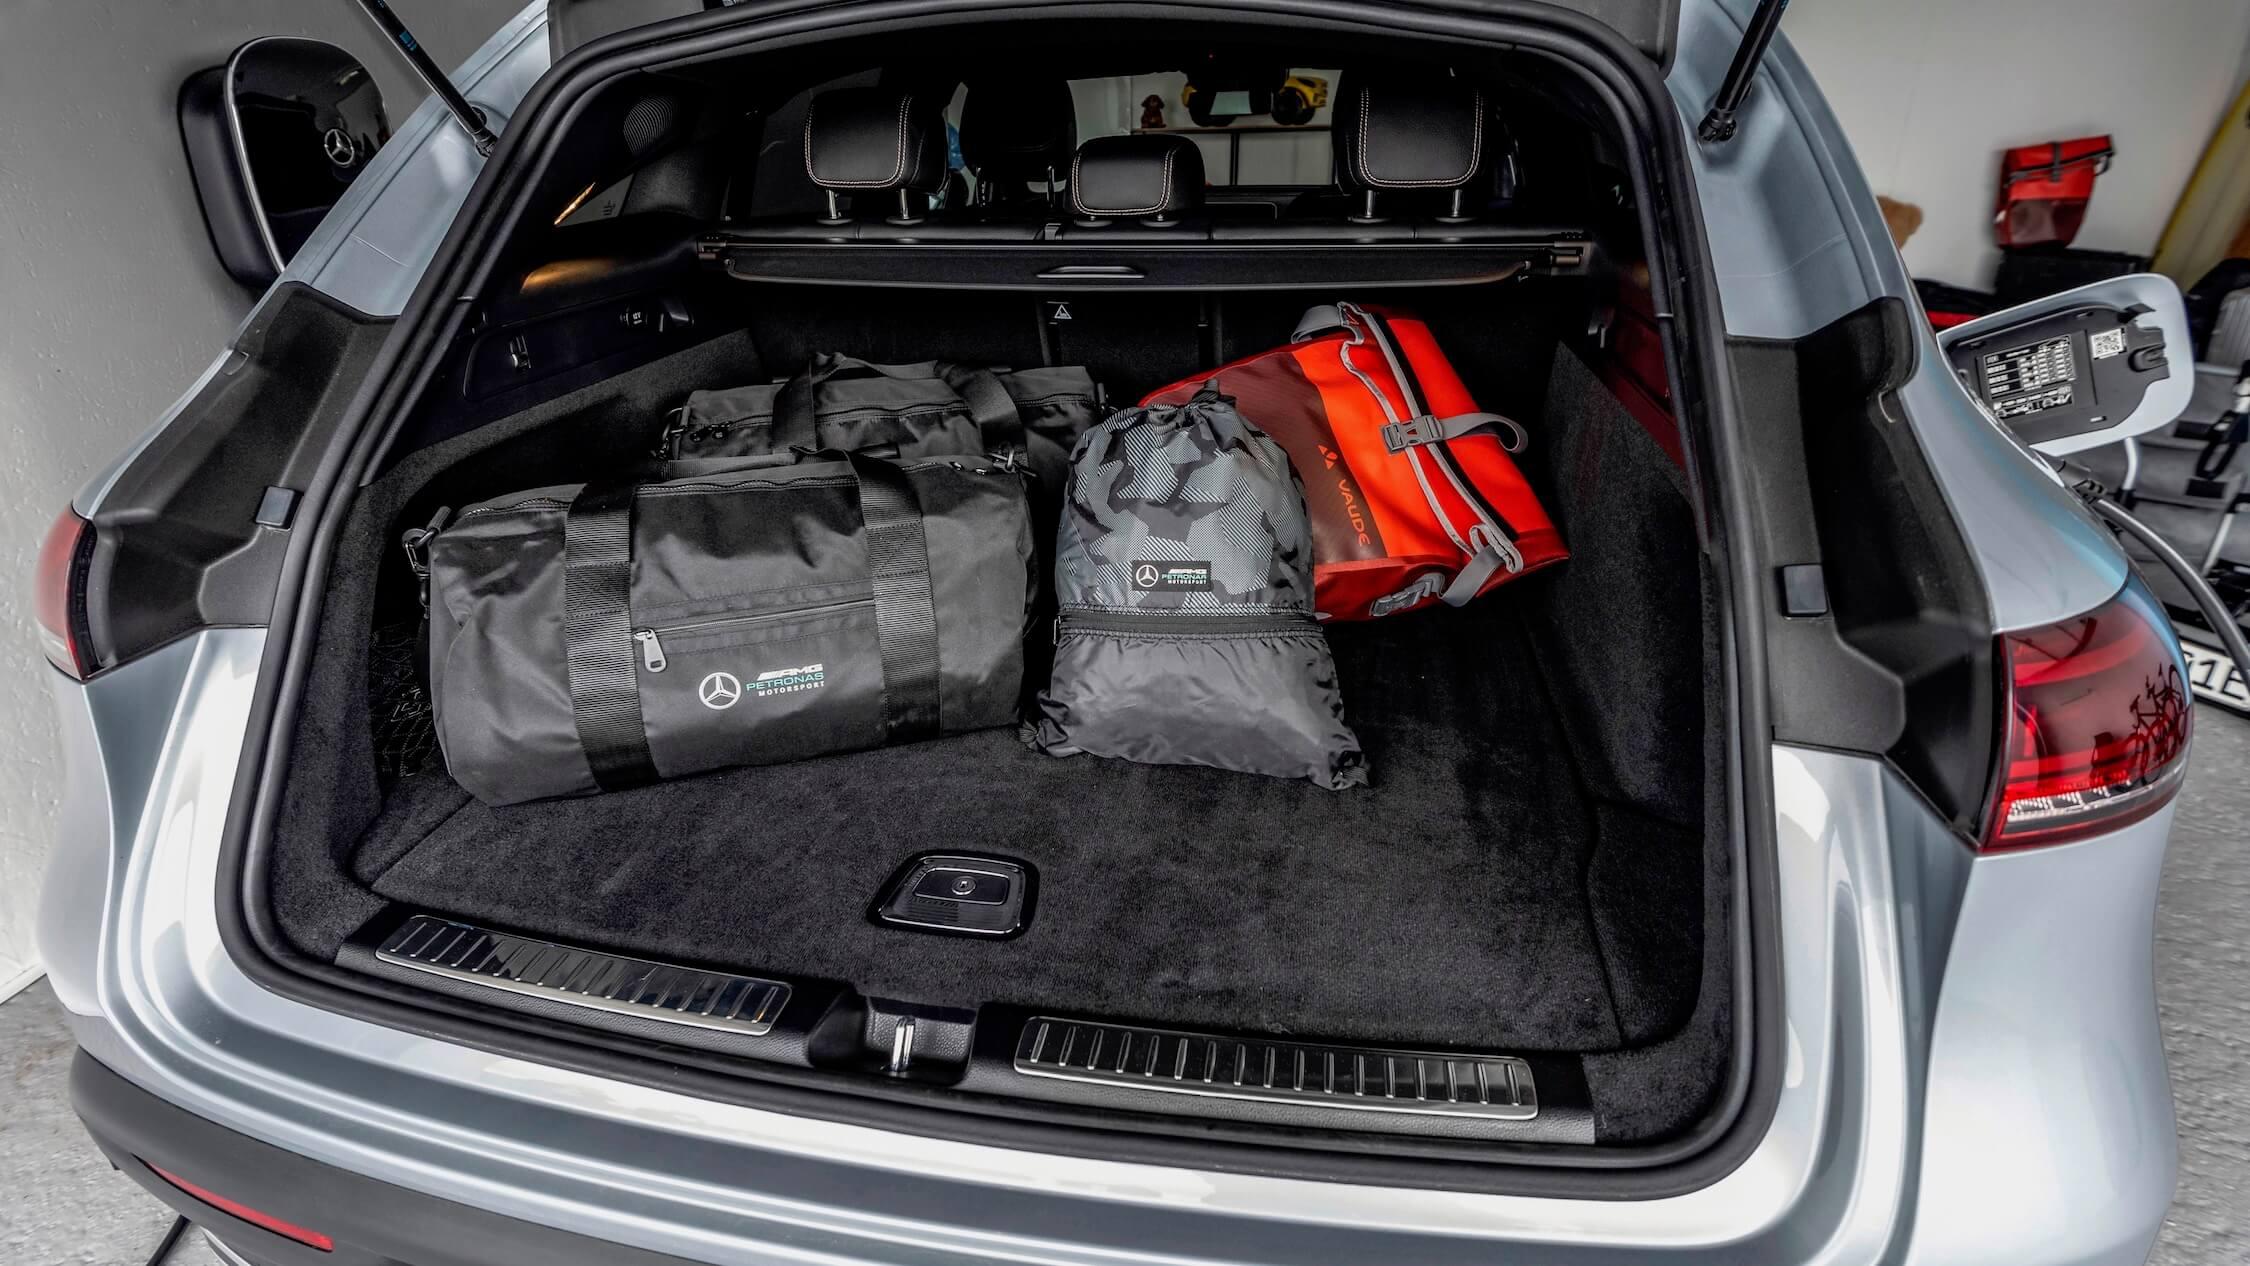 Mercedes EQC koffer met tassen